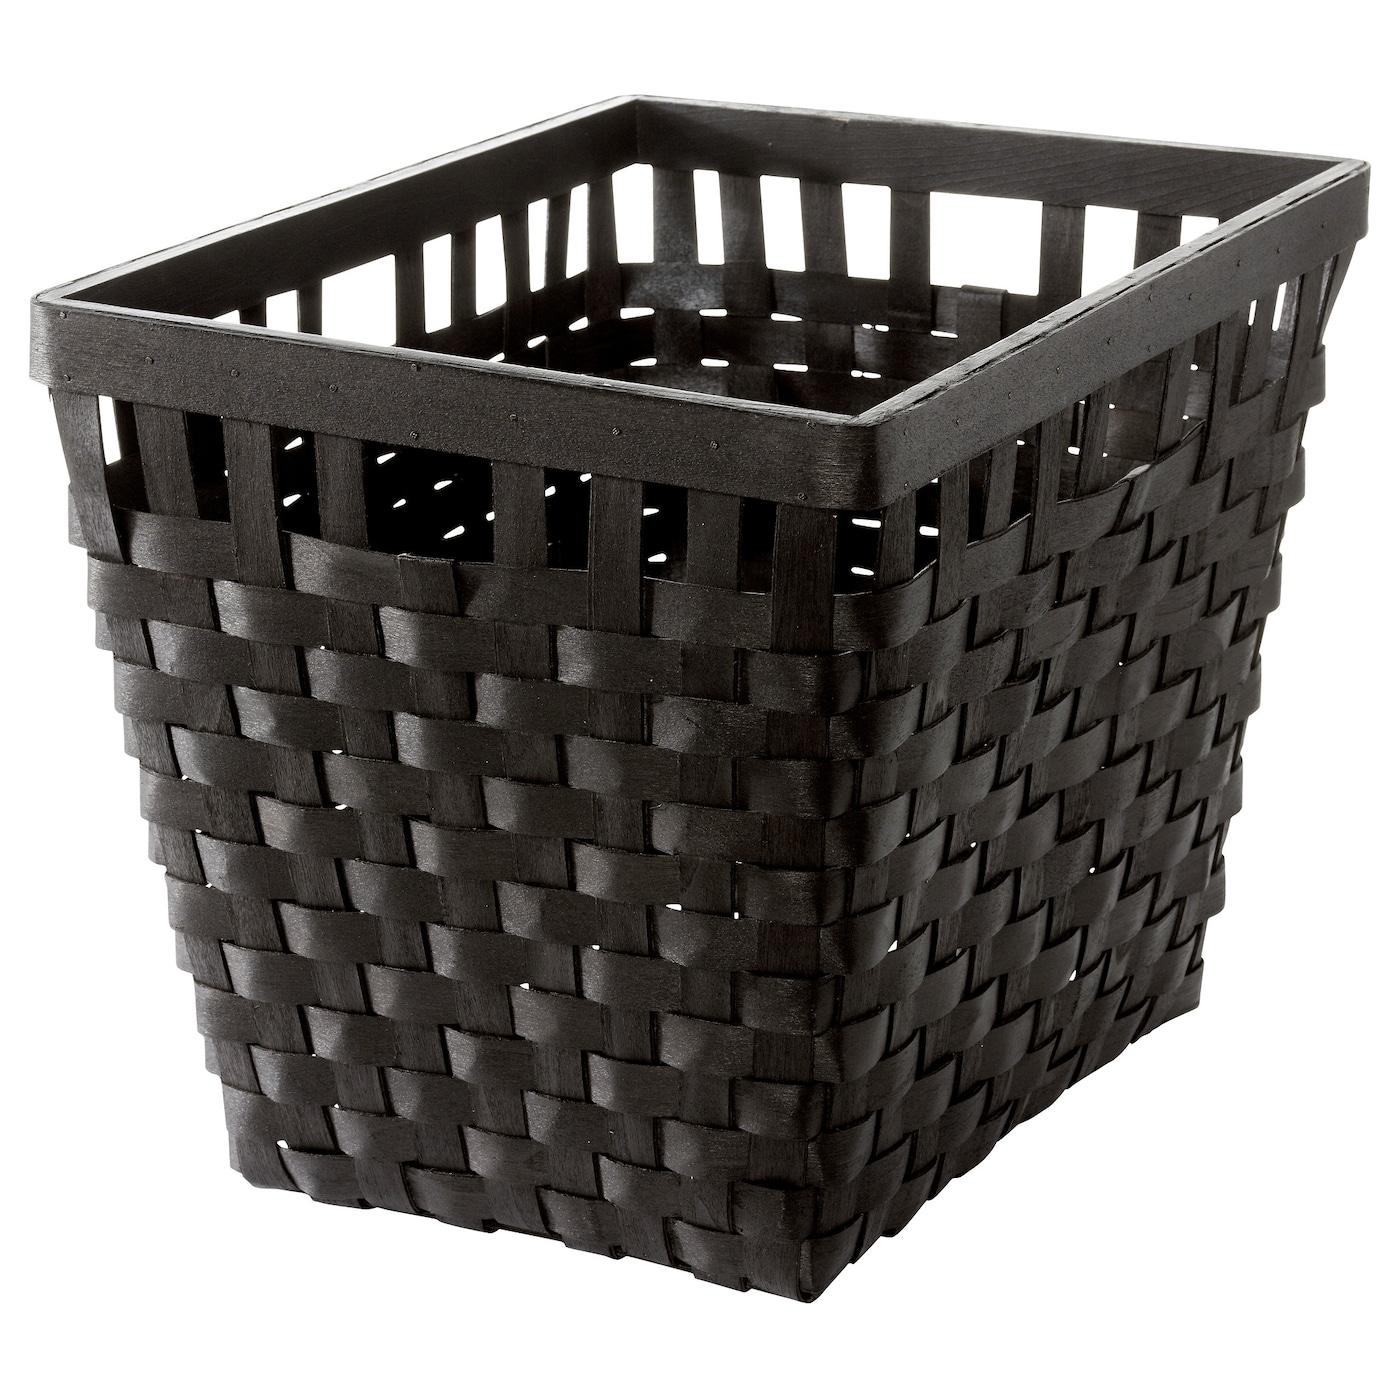 Knarra Basket Black Brown 38x29x30 Cm Ikea